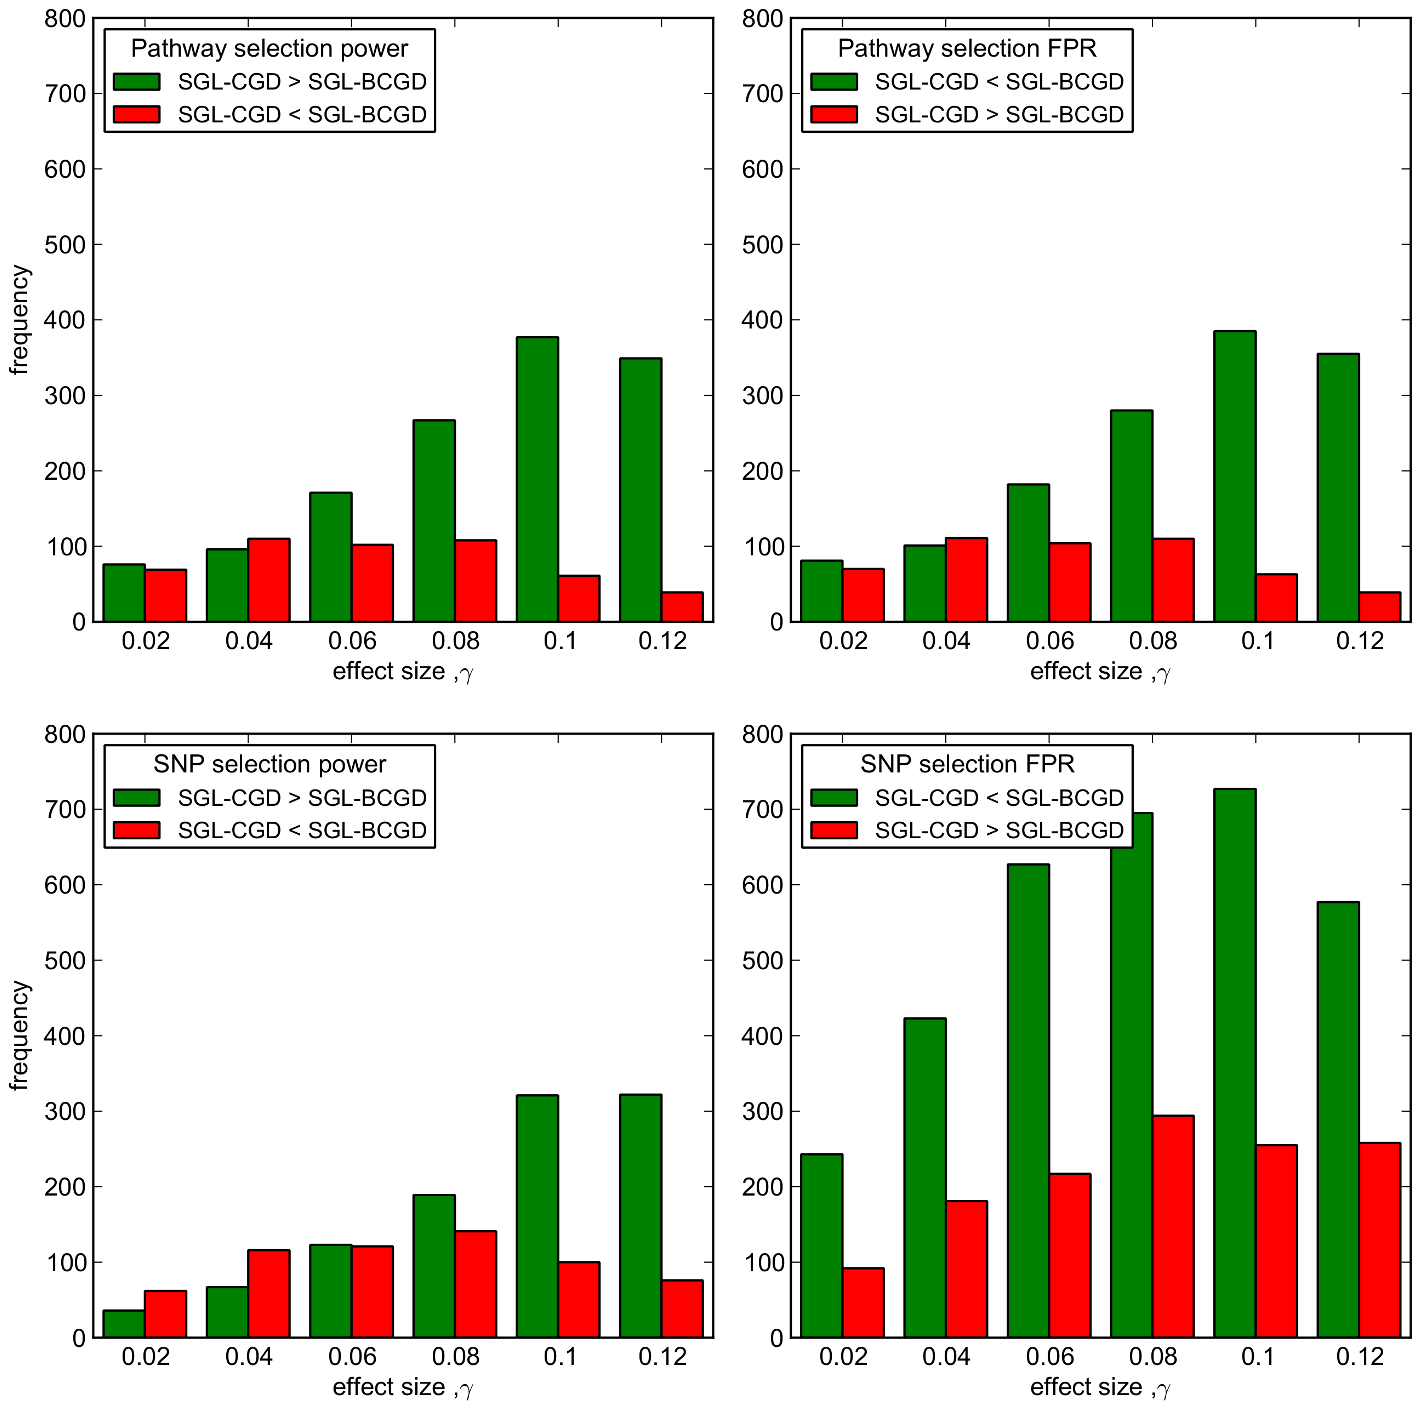 SGL-CGD vs SGL-BCGD performance, measured across 2000 MC simulations.